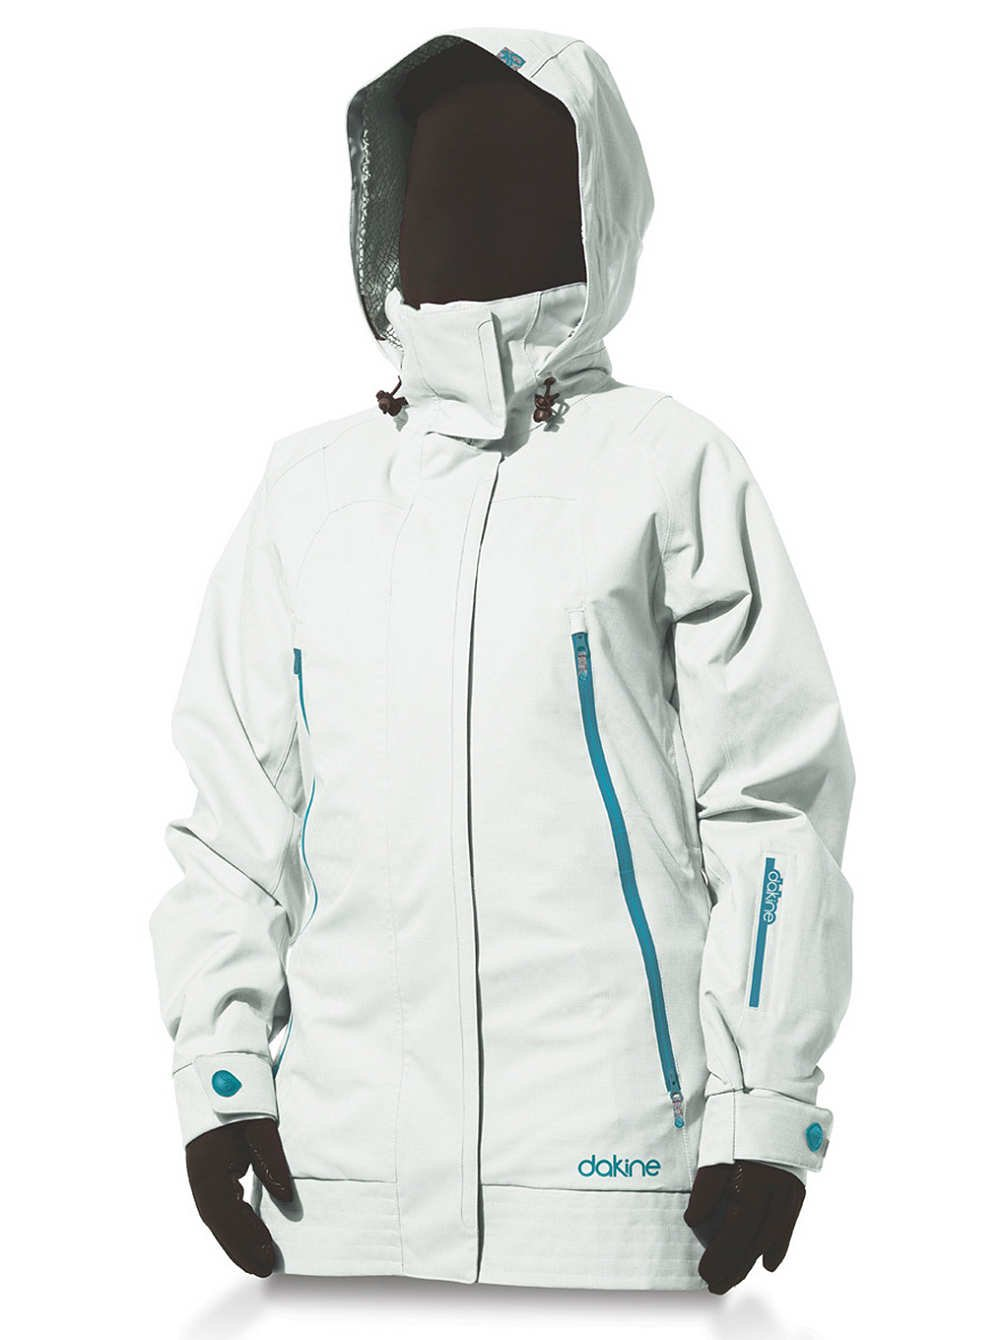 Damen Snowboard Jacke Dakine Jade Jacket Women günstig bestellen